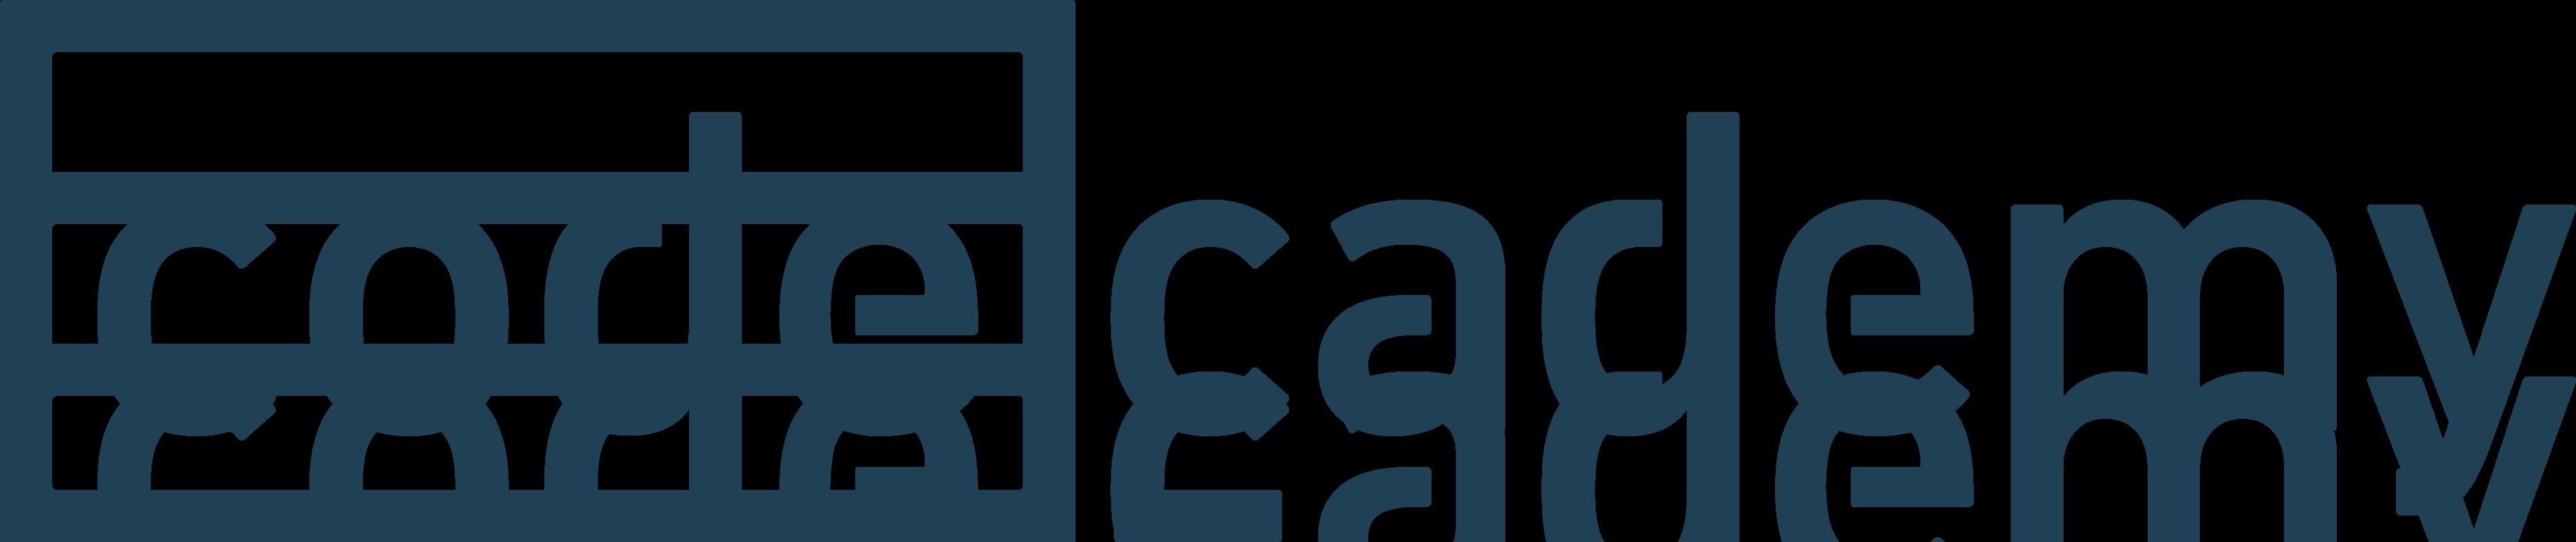 logo_blue_dark